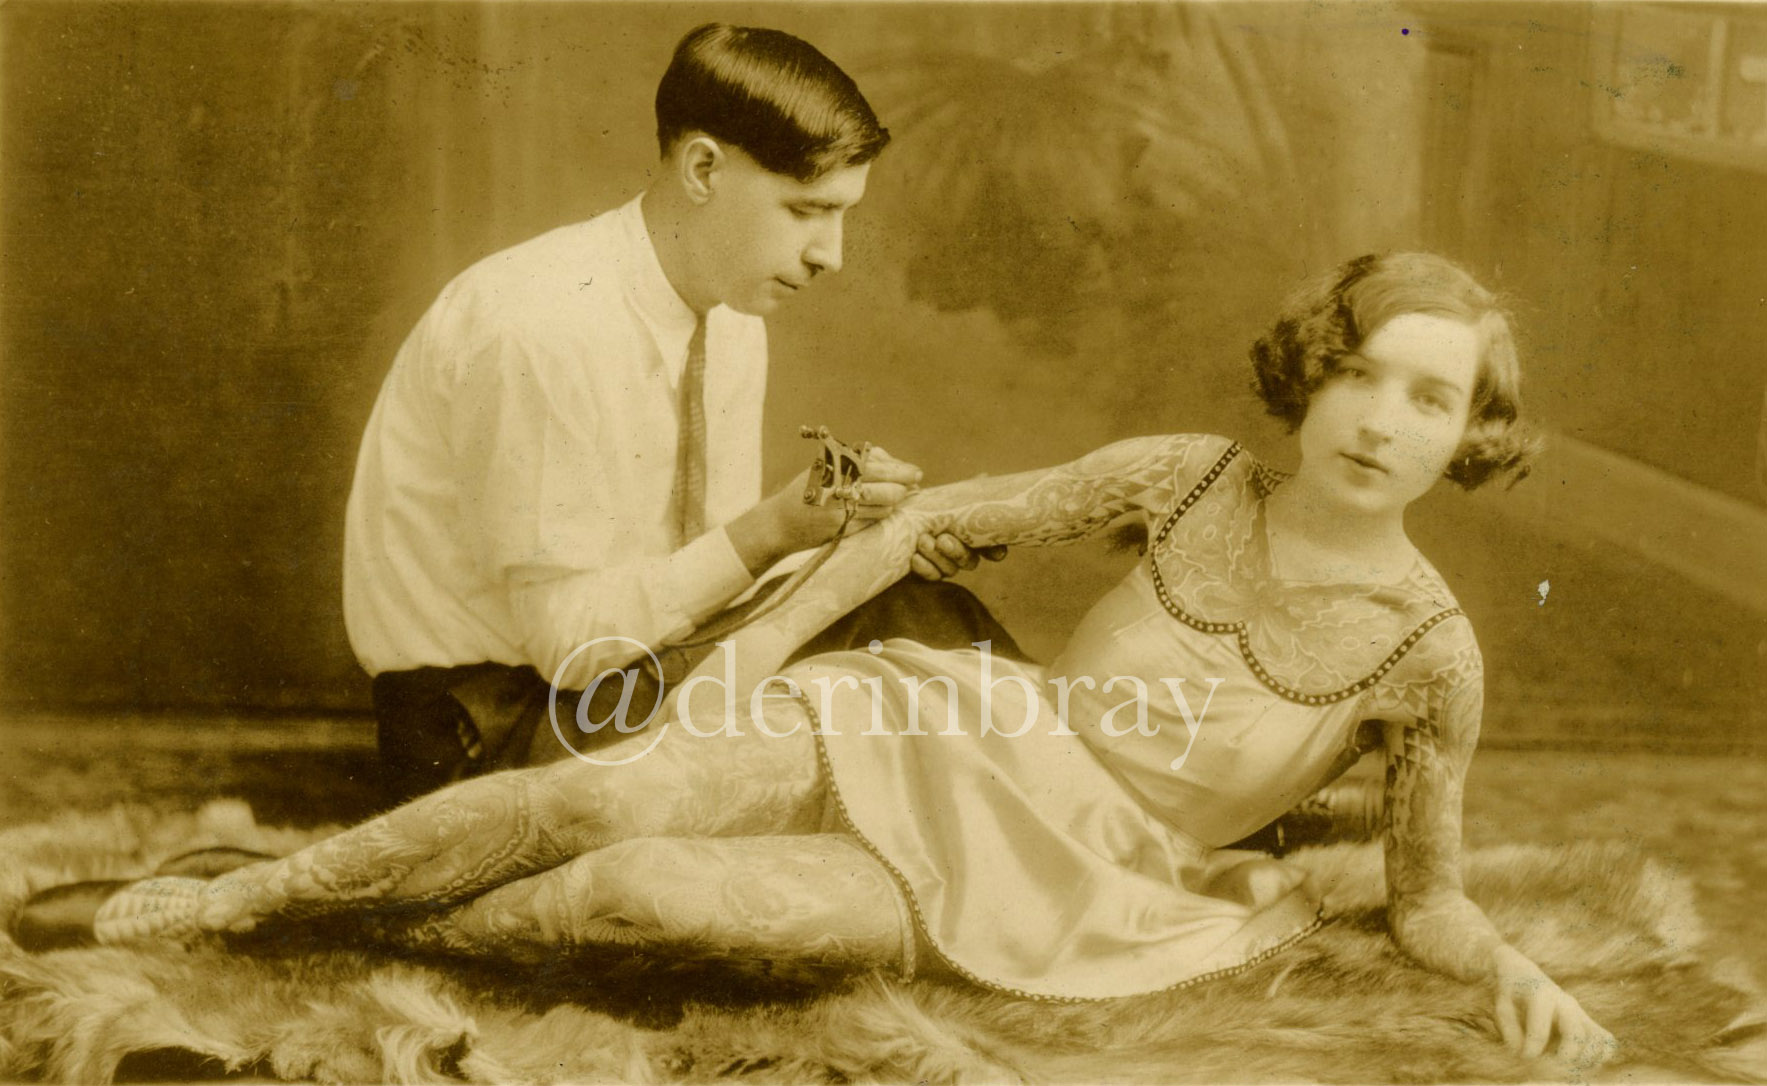 Deafy and Stella Grassman, Philadelphia, PA, ca. 1925